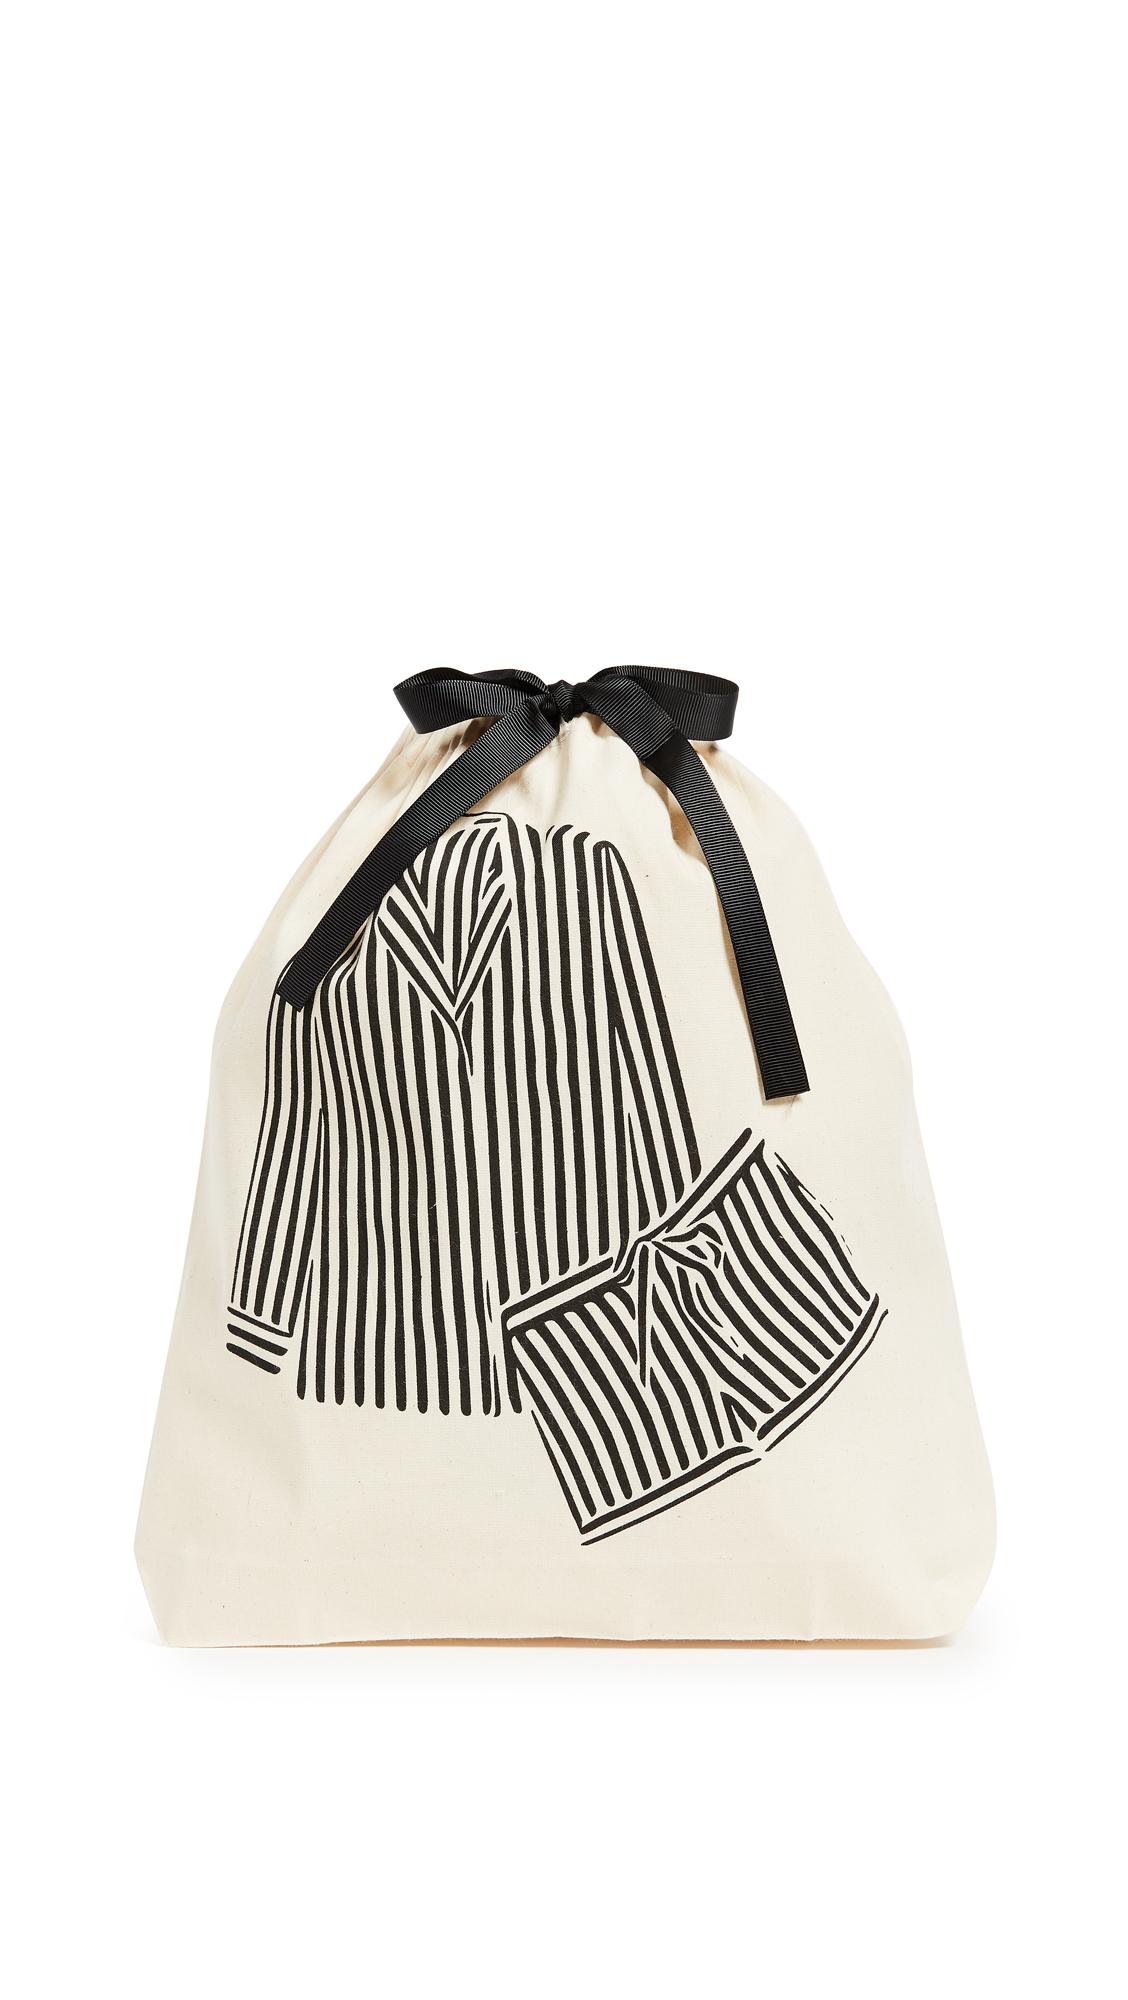 Bag-all Striped Pajamas Organizing Bag - Natural/Black